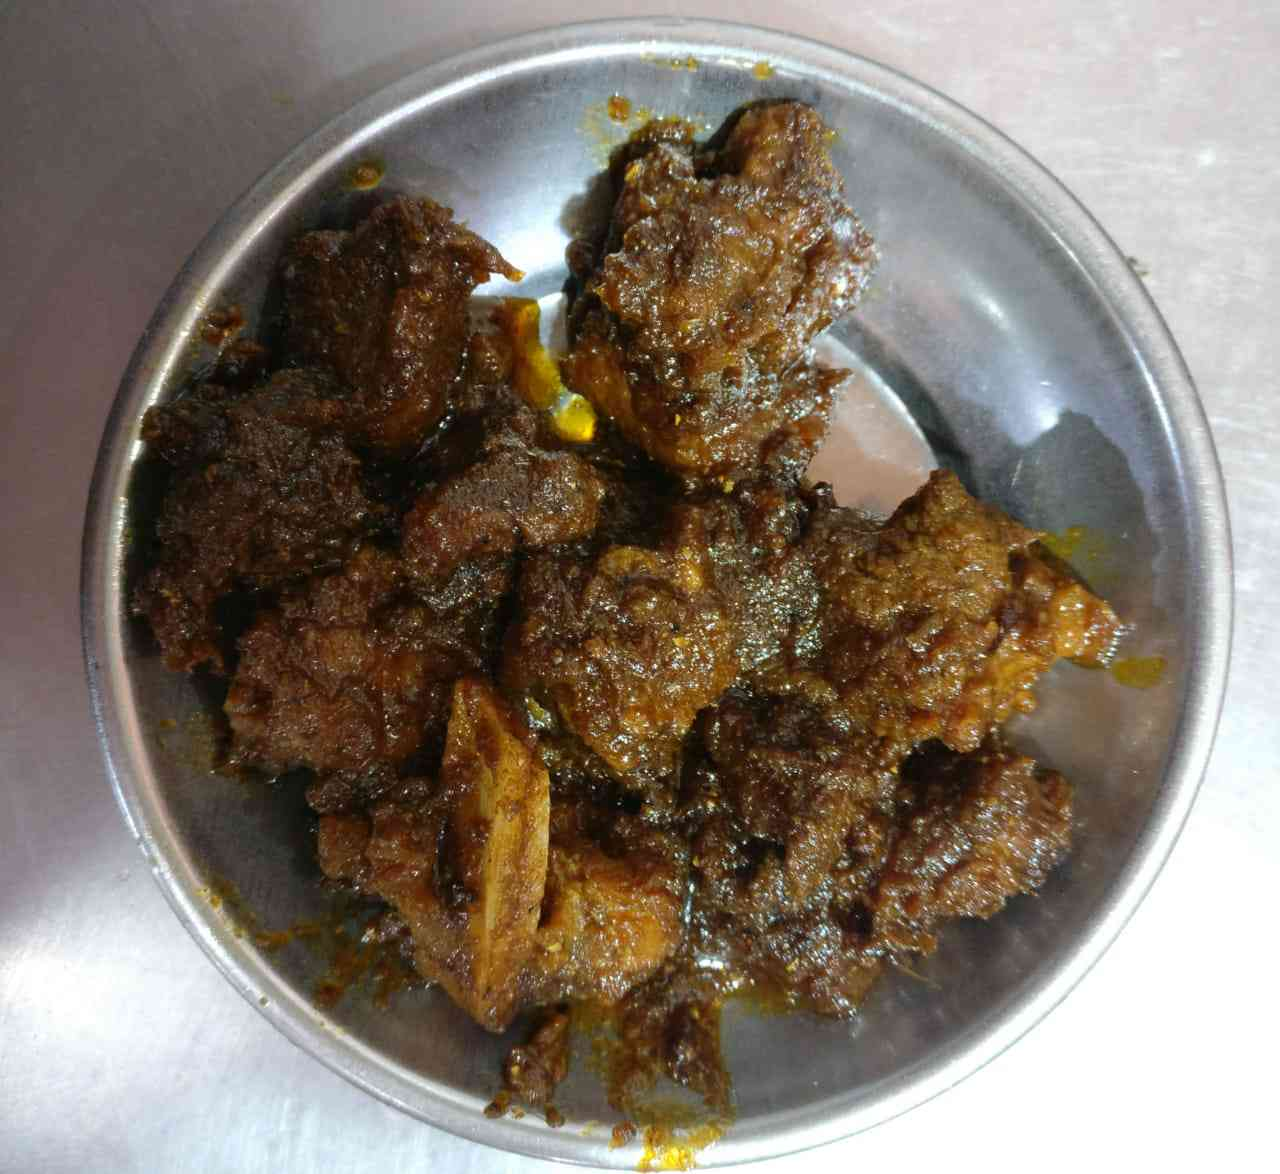 The pagla bhuna, crazy roast, at Bengal Hotel on Ripon Street